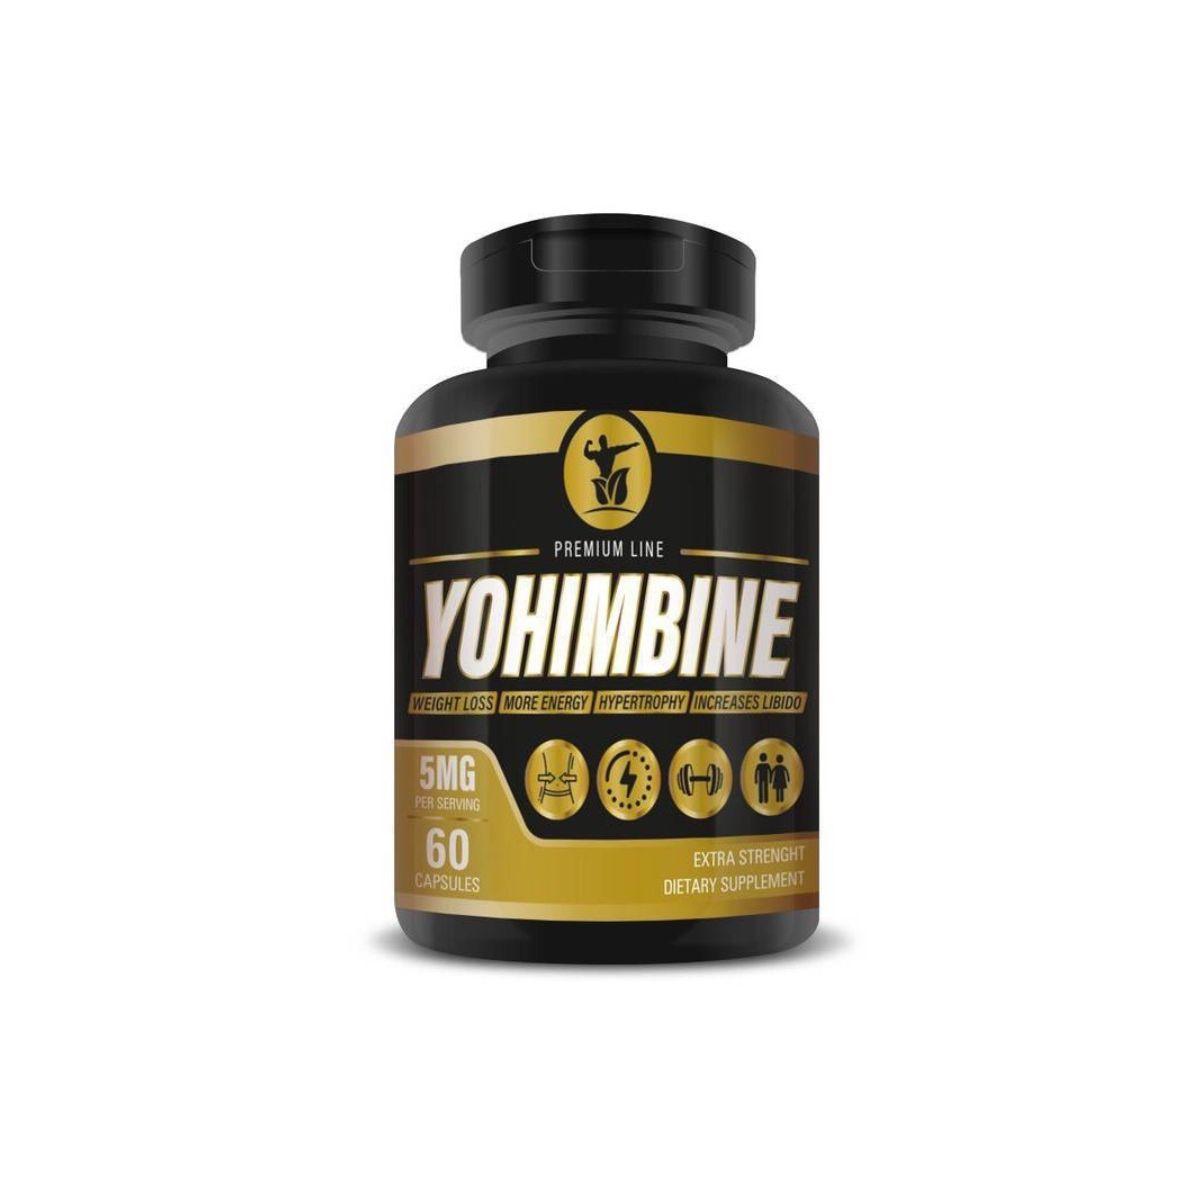 Yohimbine 5mg 60 Caps - Premium Line